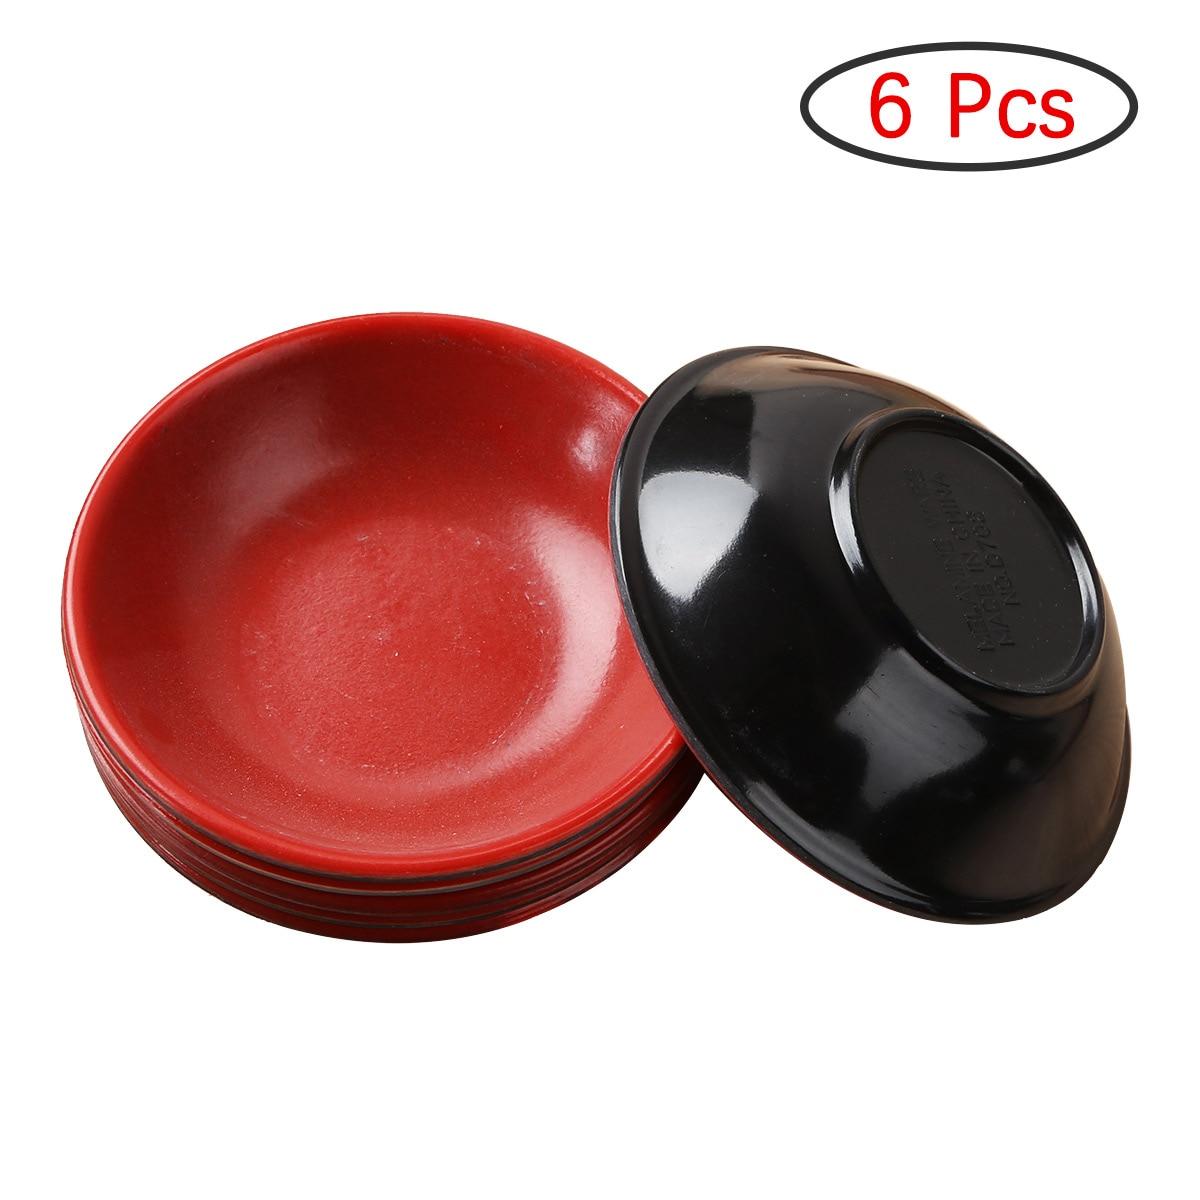 6Pcs Sauce Dishes Tableware Break Resistant Dishwasher Safe Round Melamine Sauce Dishes Dipping Bowls for Homes Restaurants